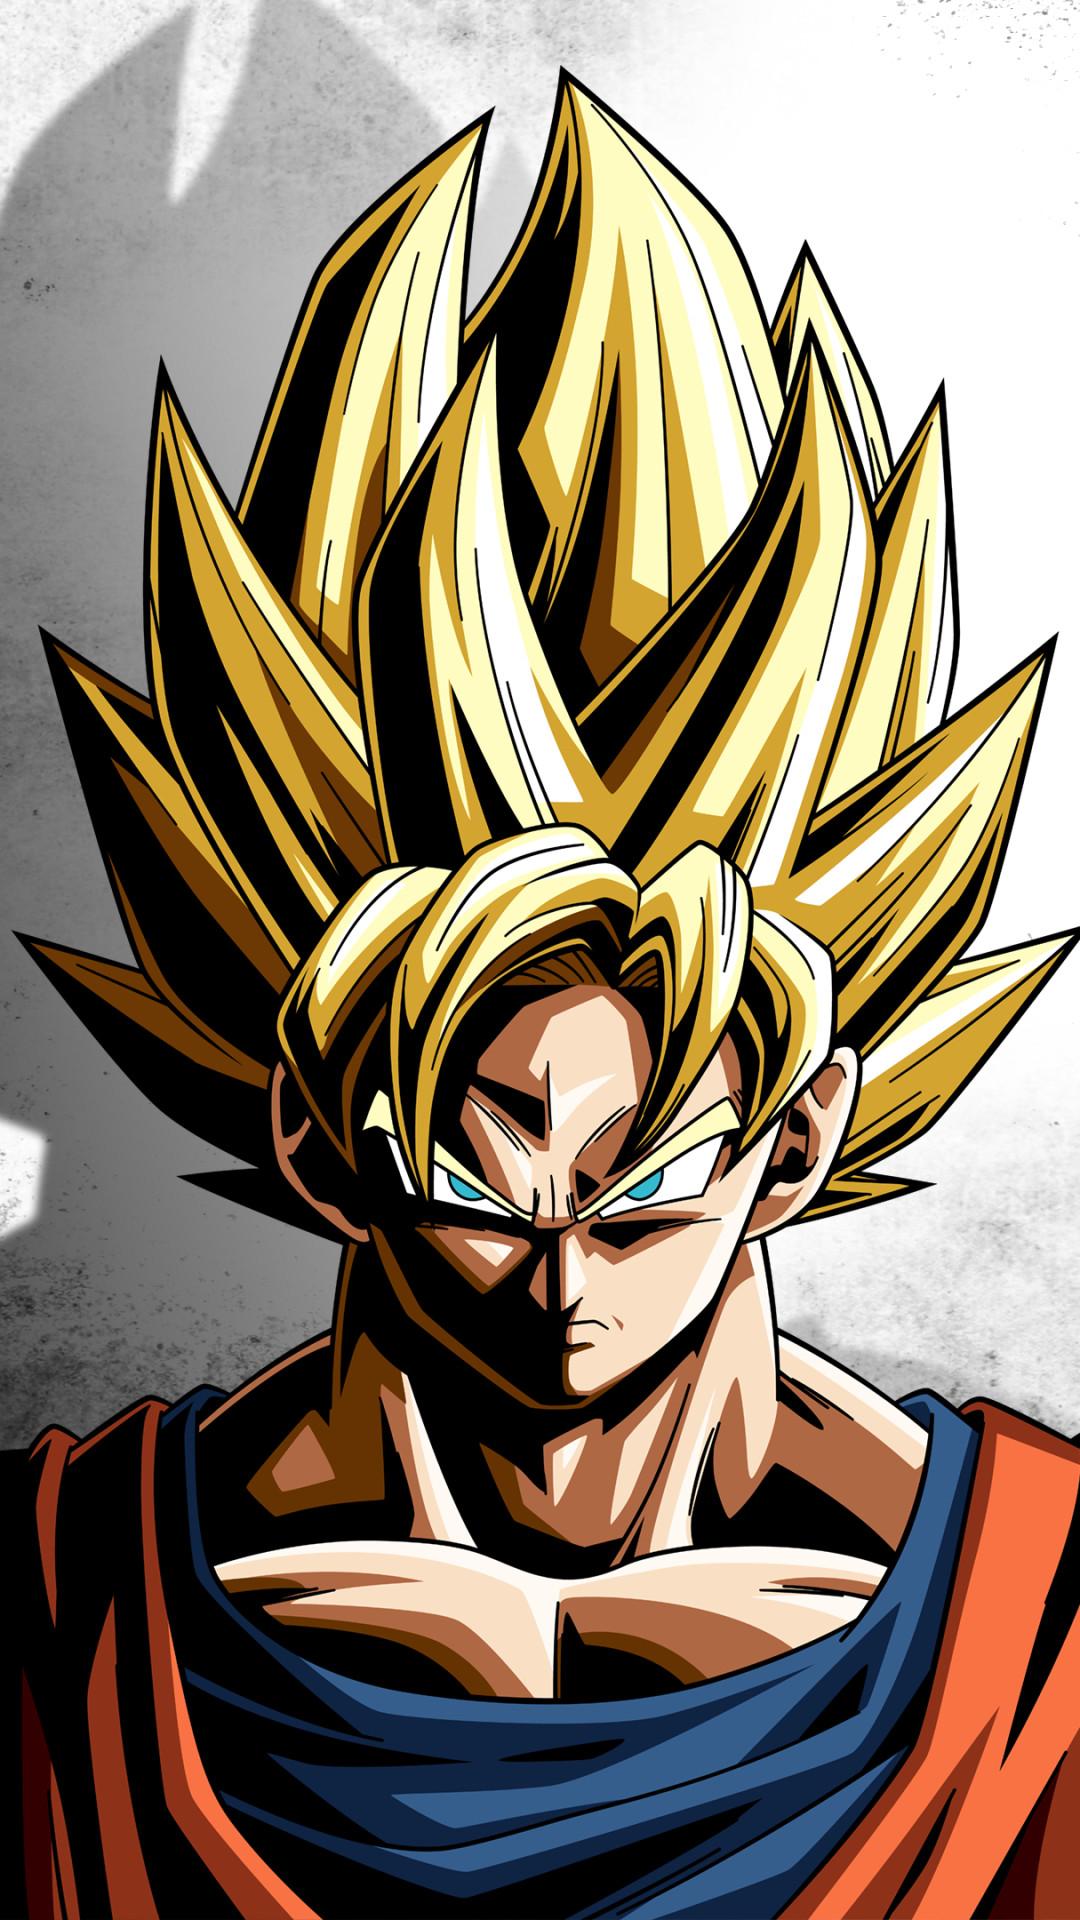 … Dragon Ball Z Wallpaper For Mobile Iphone 7 Plus – Anime/dragon Ball Z  …